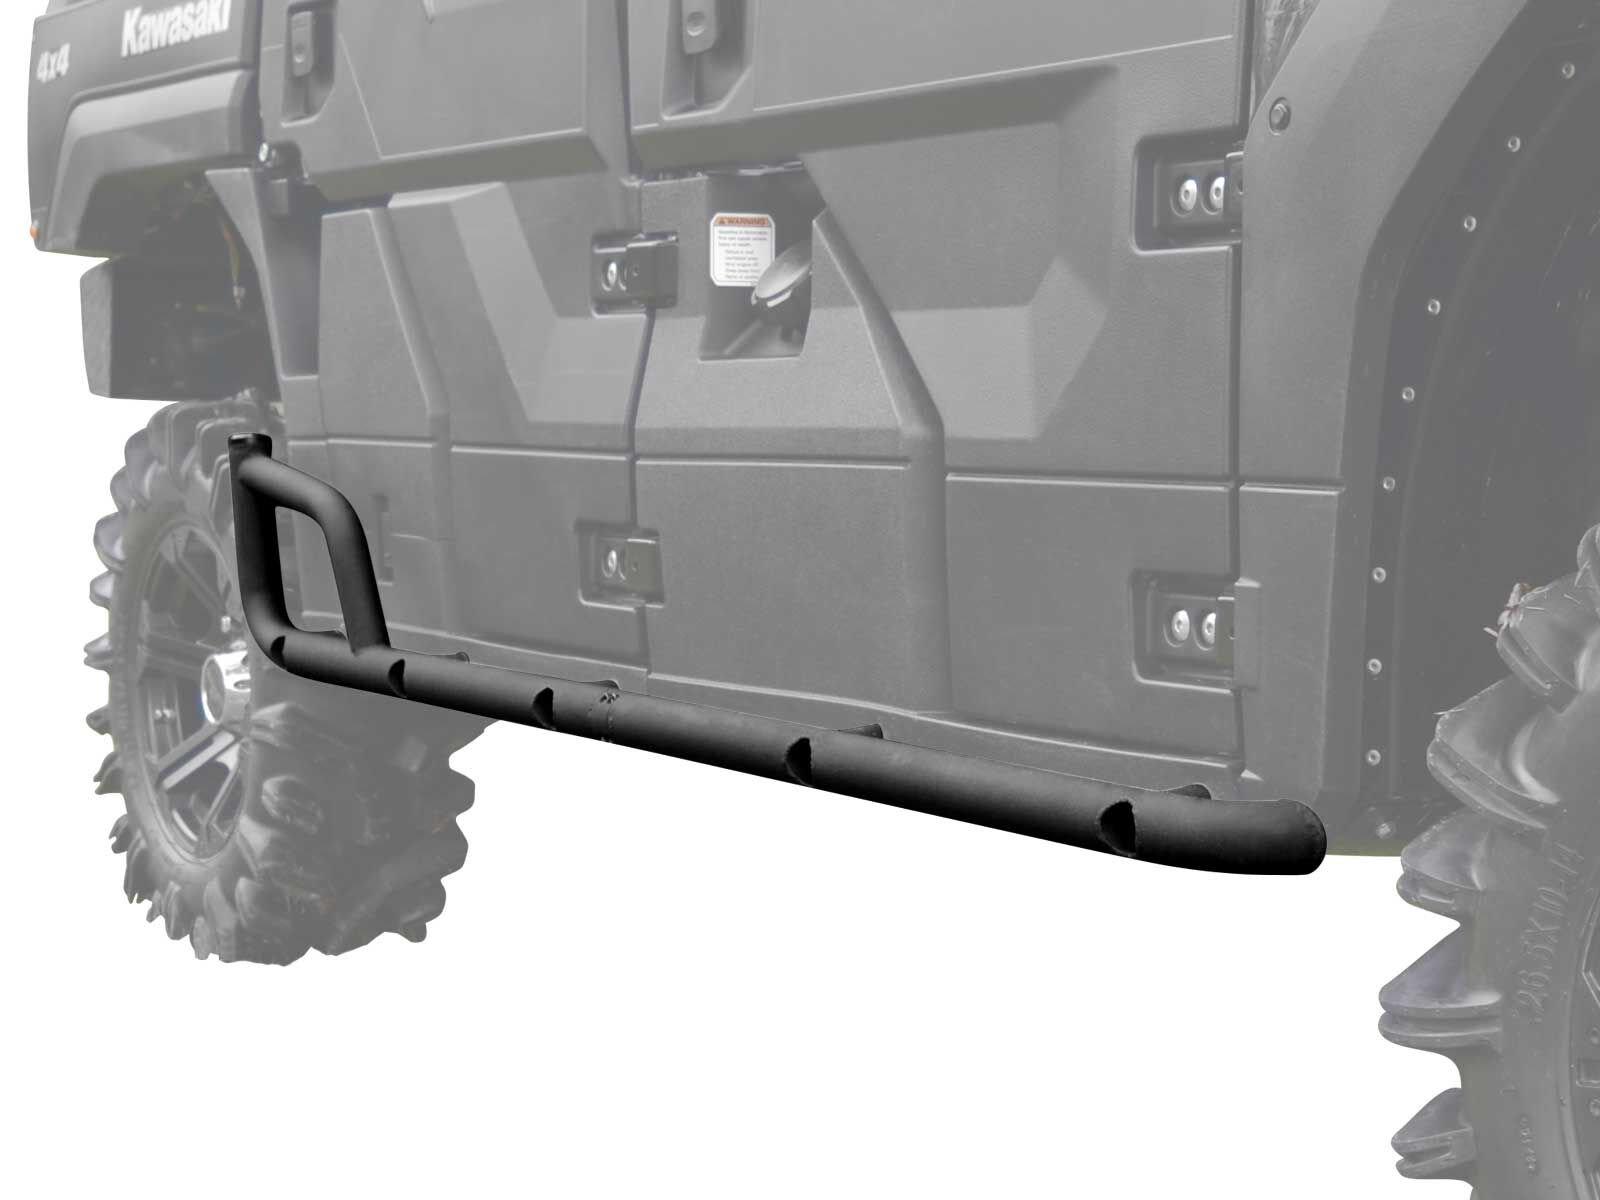 SuperATV Kawasaki Mule Pro DX / DXT / FX / FXT / FXR Heavy Duty Nerf Bars / Rock Sliders (2015+)